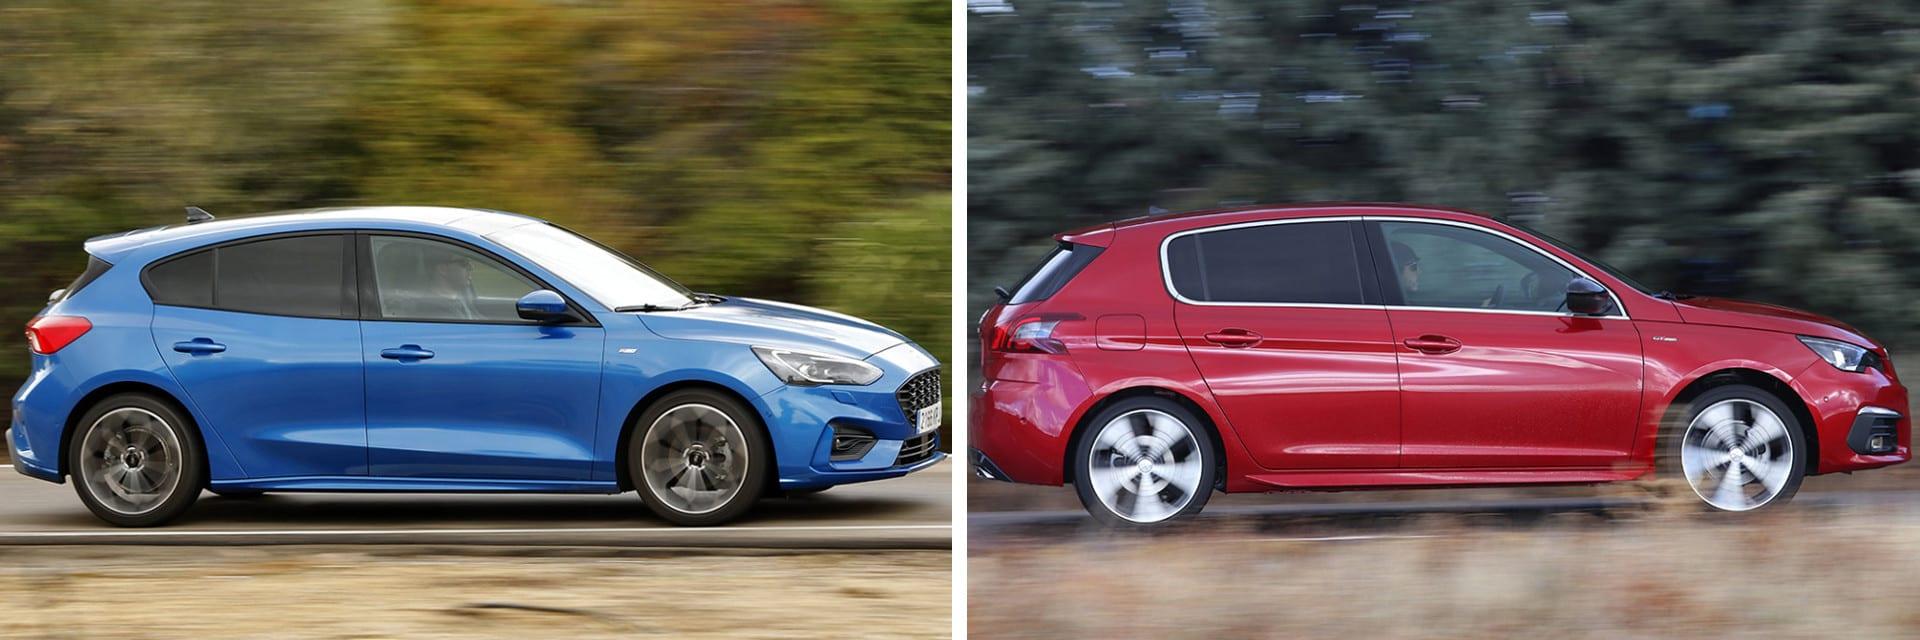 Durante las pruebas de consumo, el Ford Focus (izq.) gastó 6,3 l/100 km, mientras que el Peugeot consumió de 7,2.